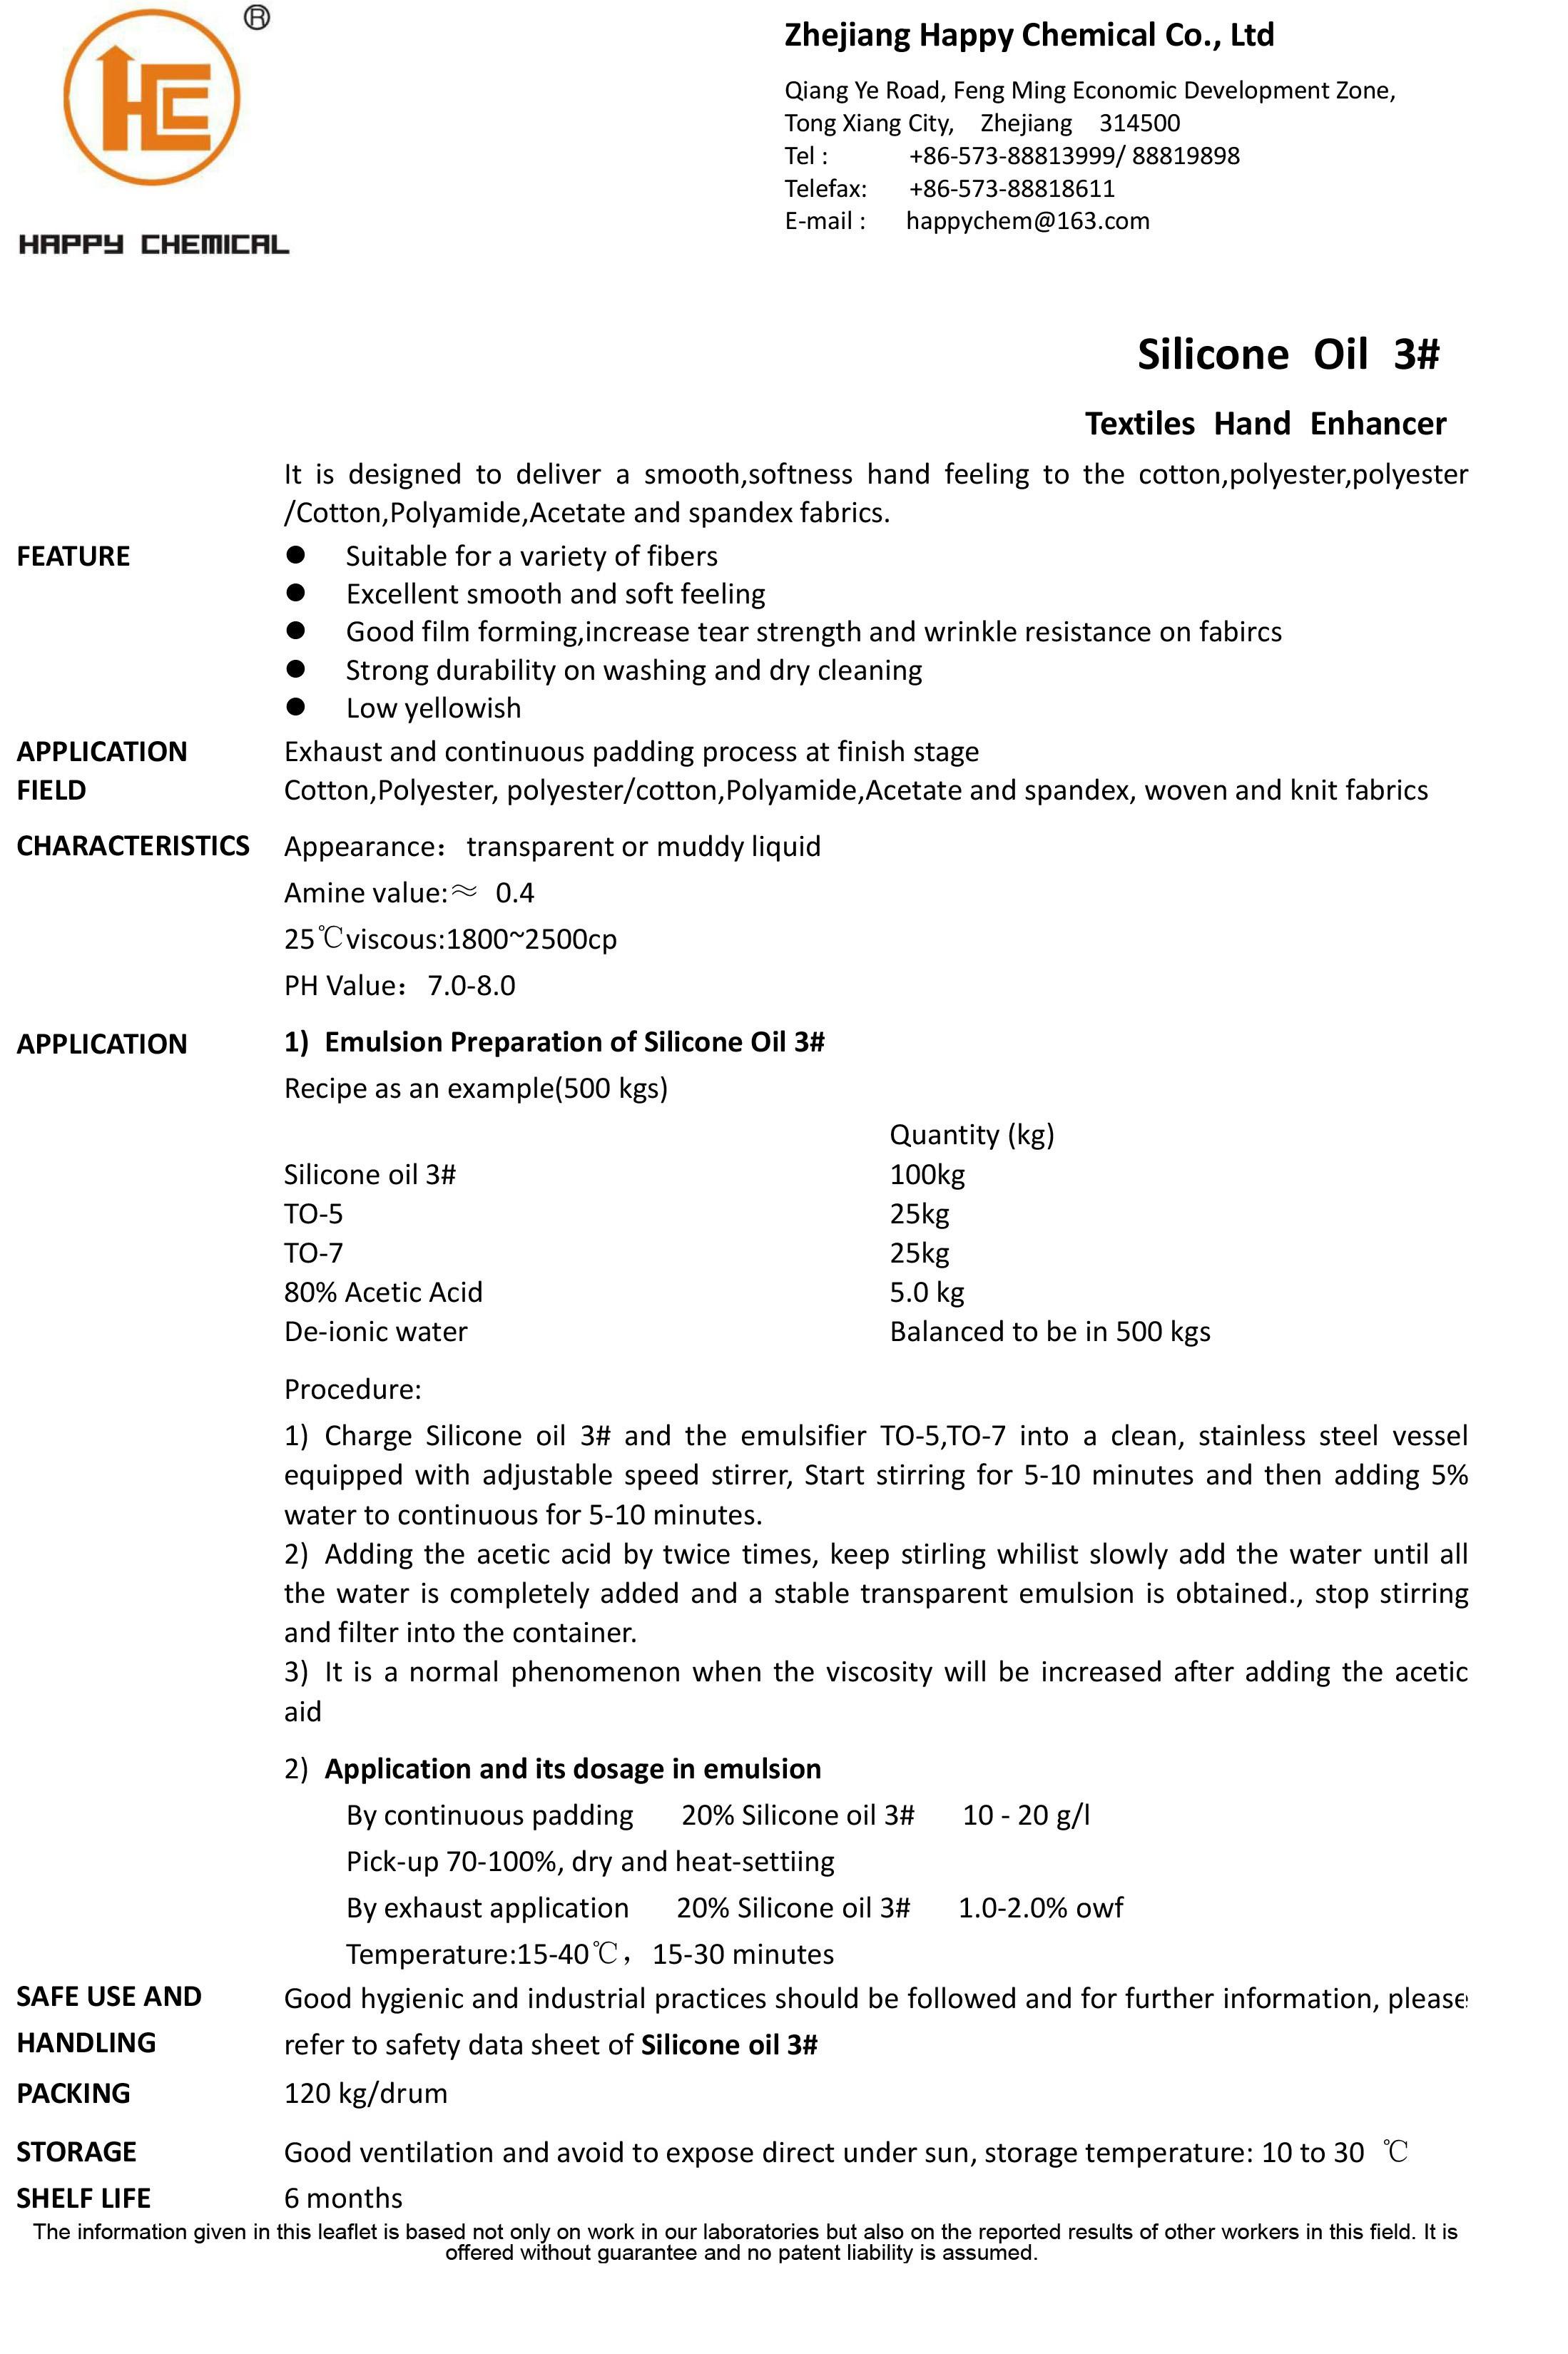 TDS Amino Silicone Oil 3 English Version.jpg